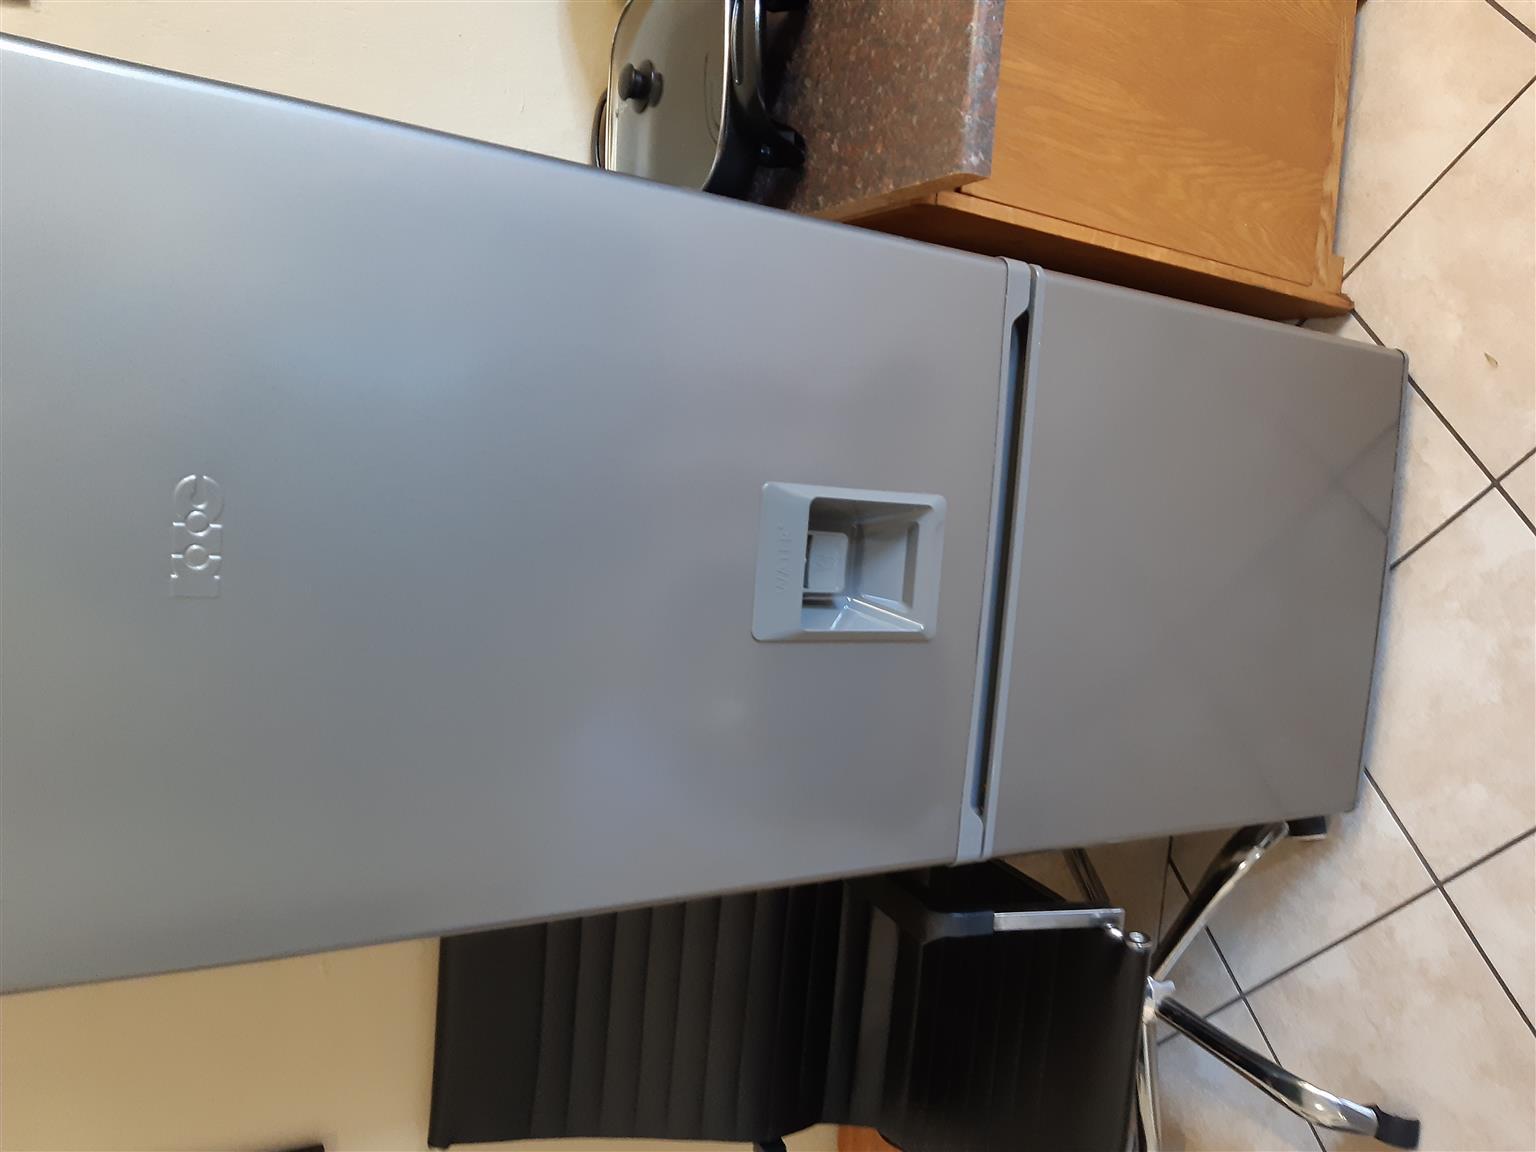 KIC Fridge & Defy Automatic Washing Machine